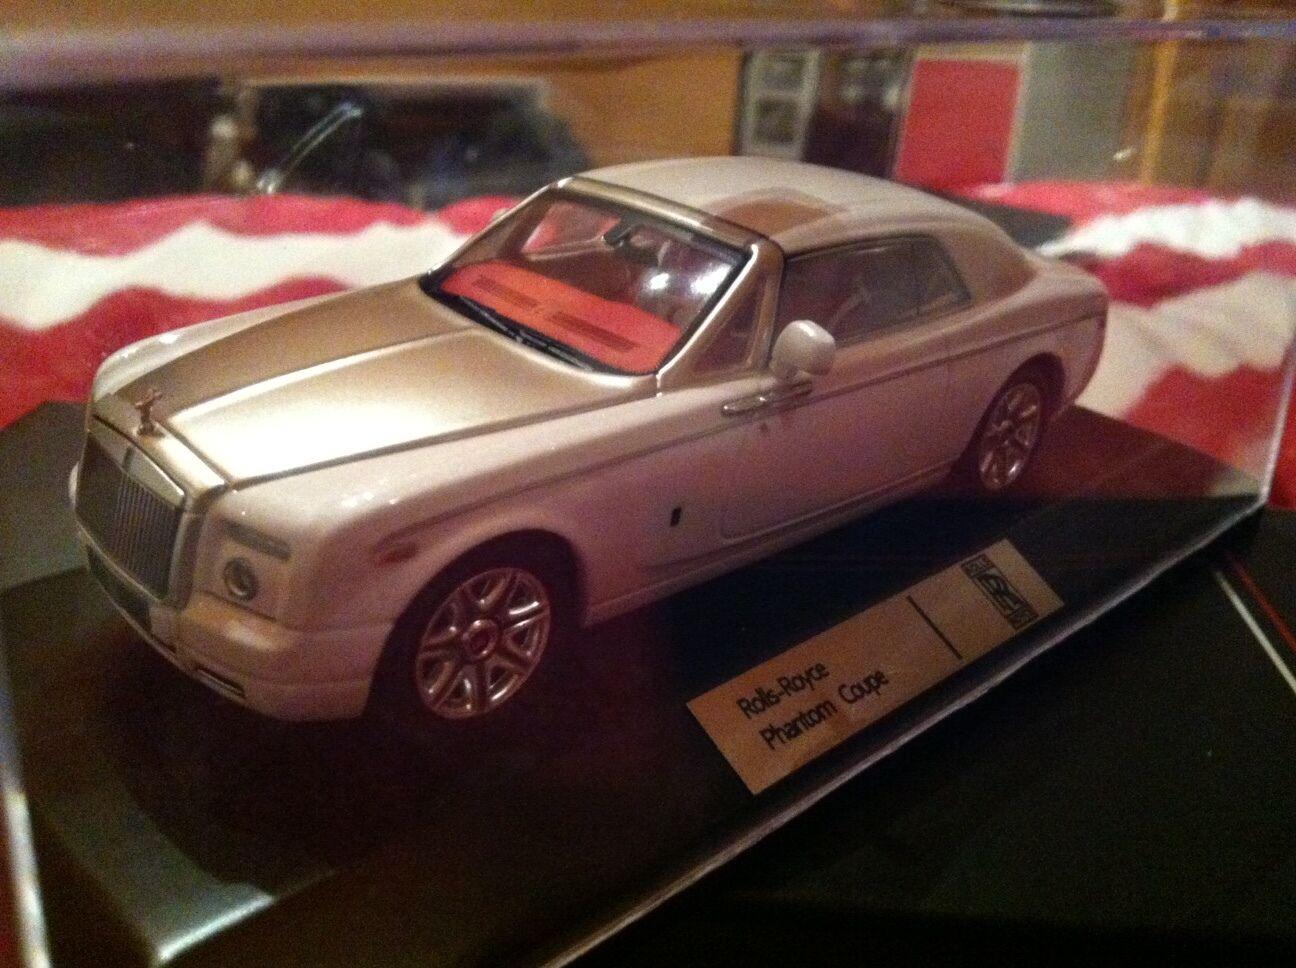 Rolls Royce Phantom Coupé 1 43 Neuve IXO